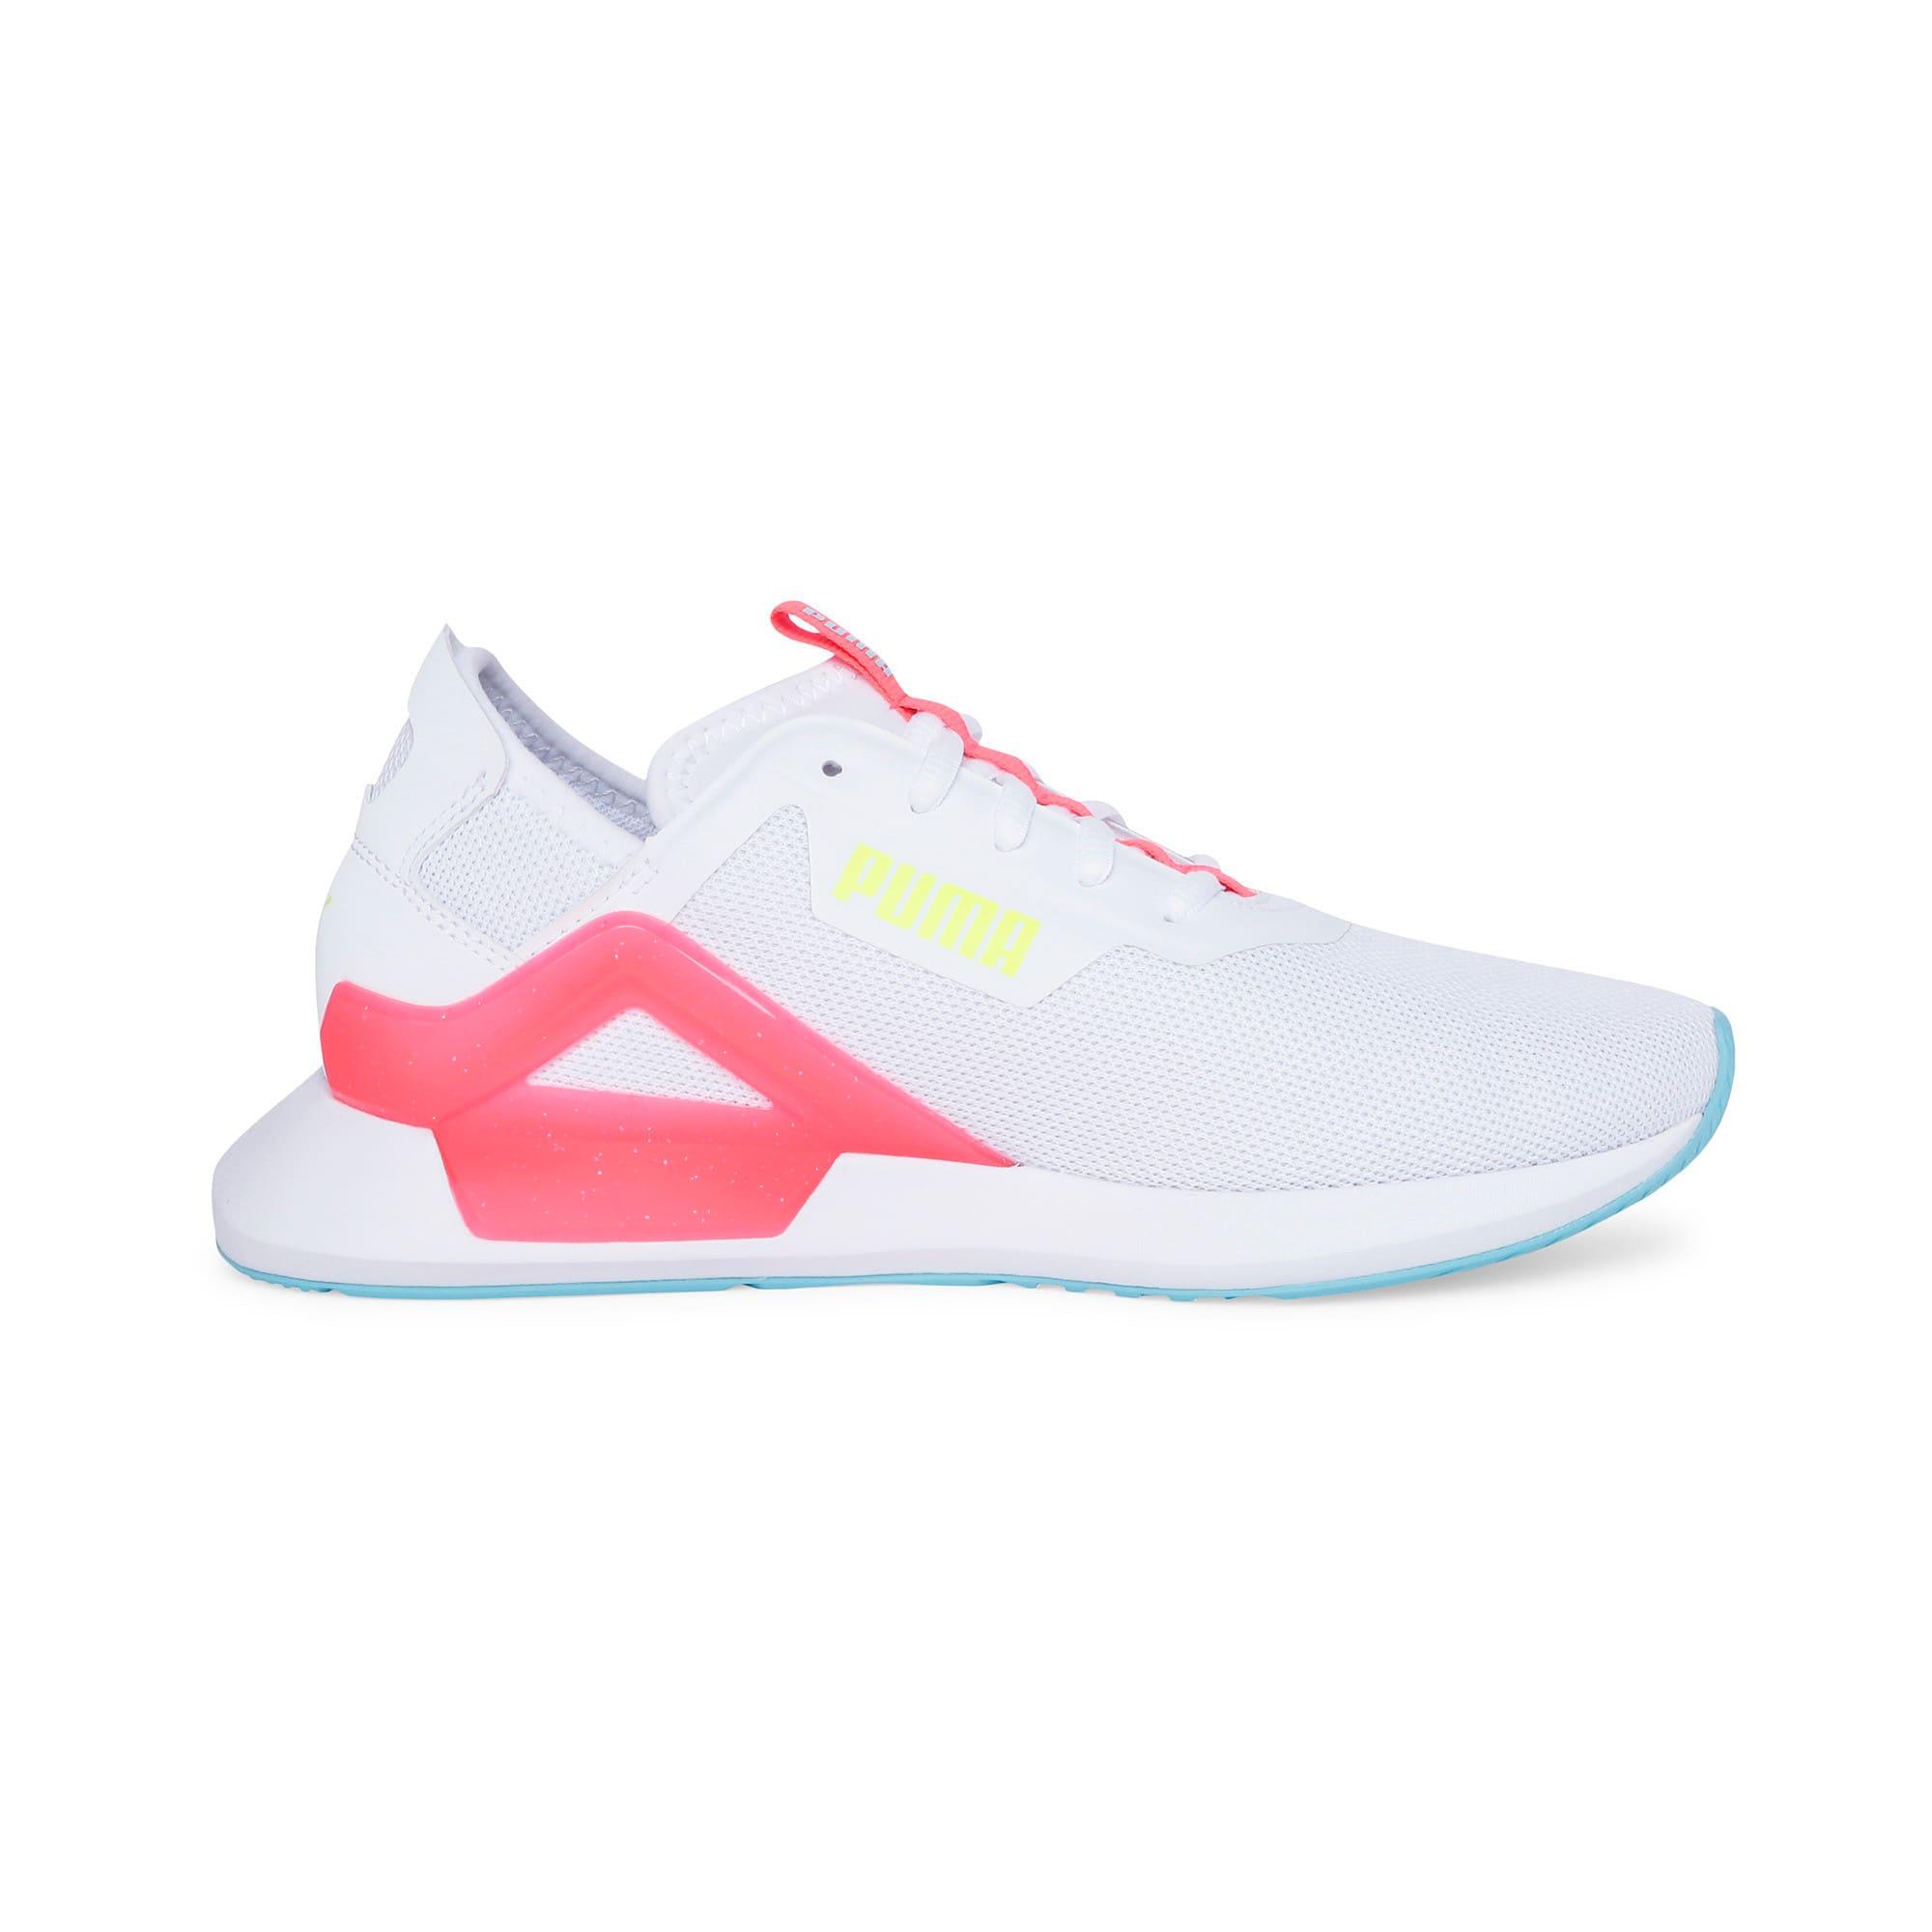 Thumbnail 7 of Rogue X Knit Women's Running Shoes, Puma White-Pink Alert, medium-IND